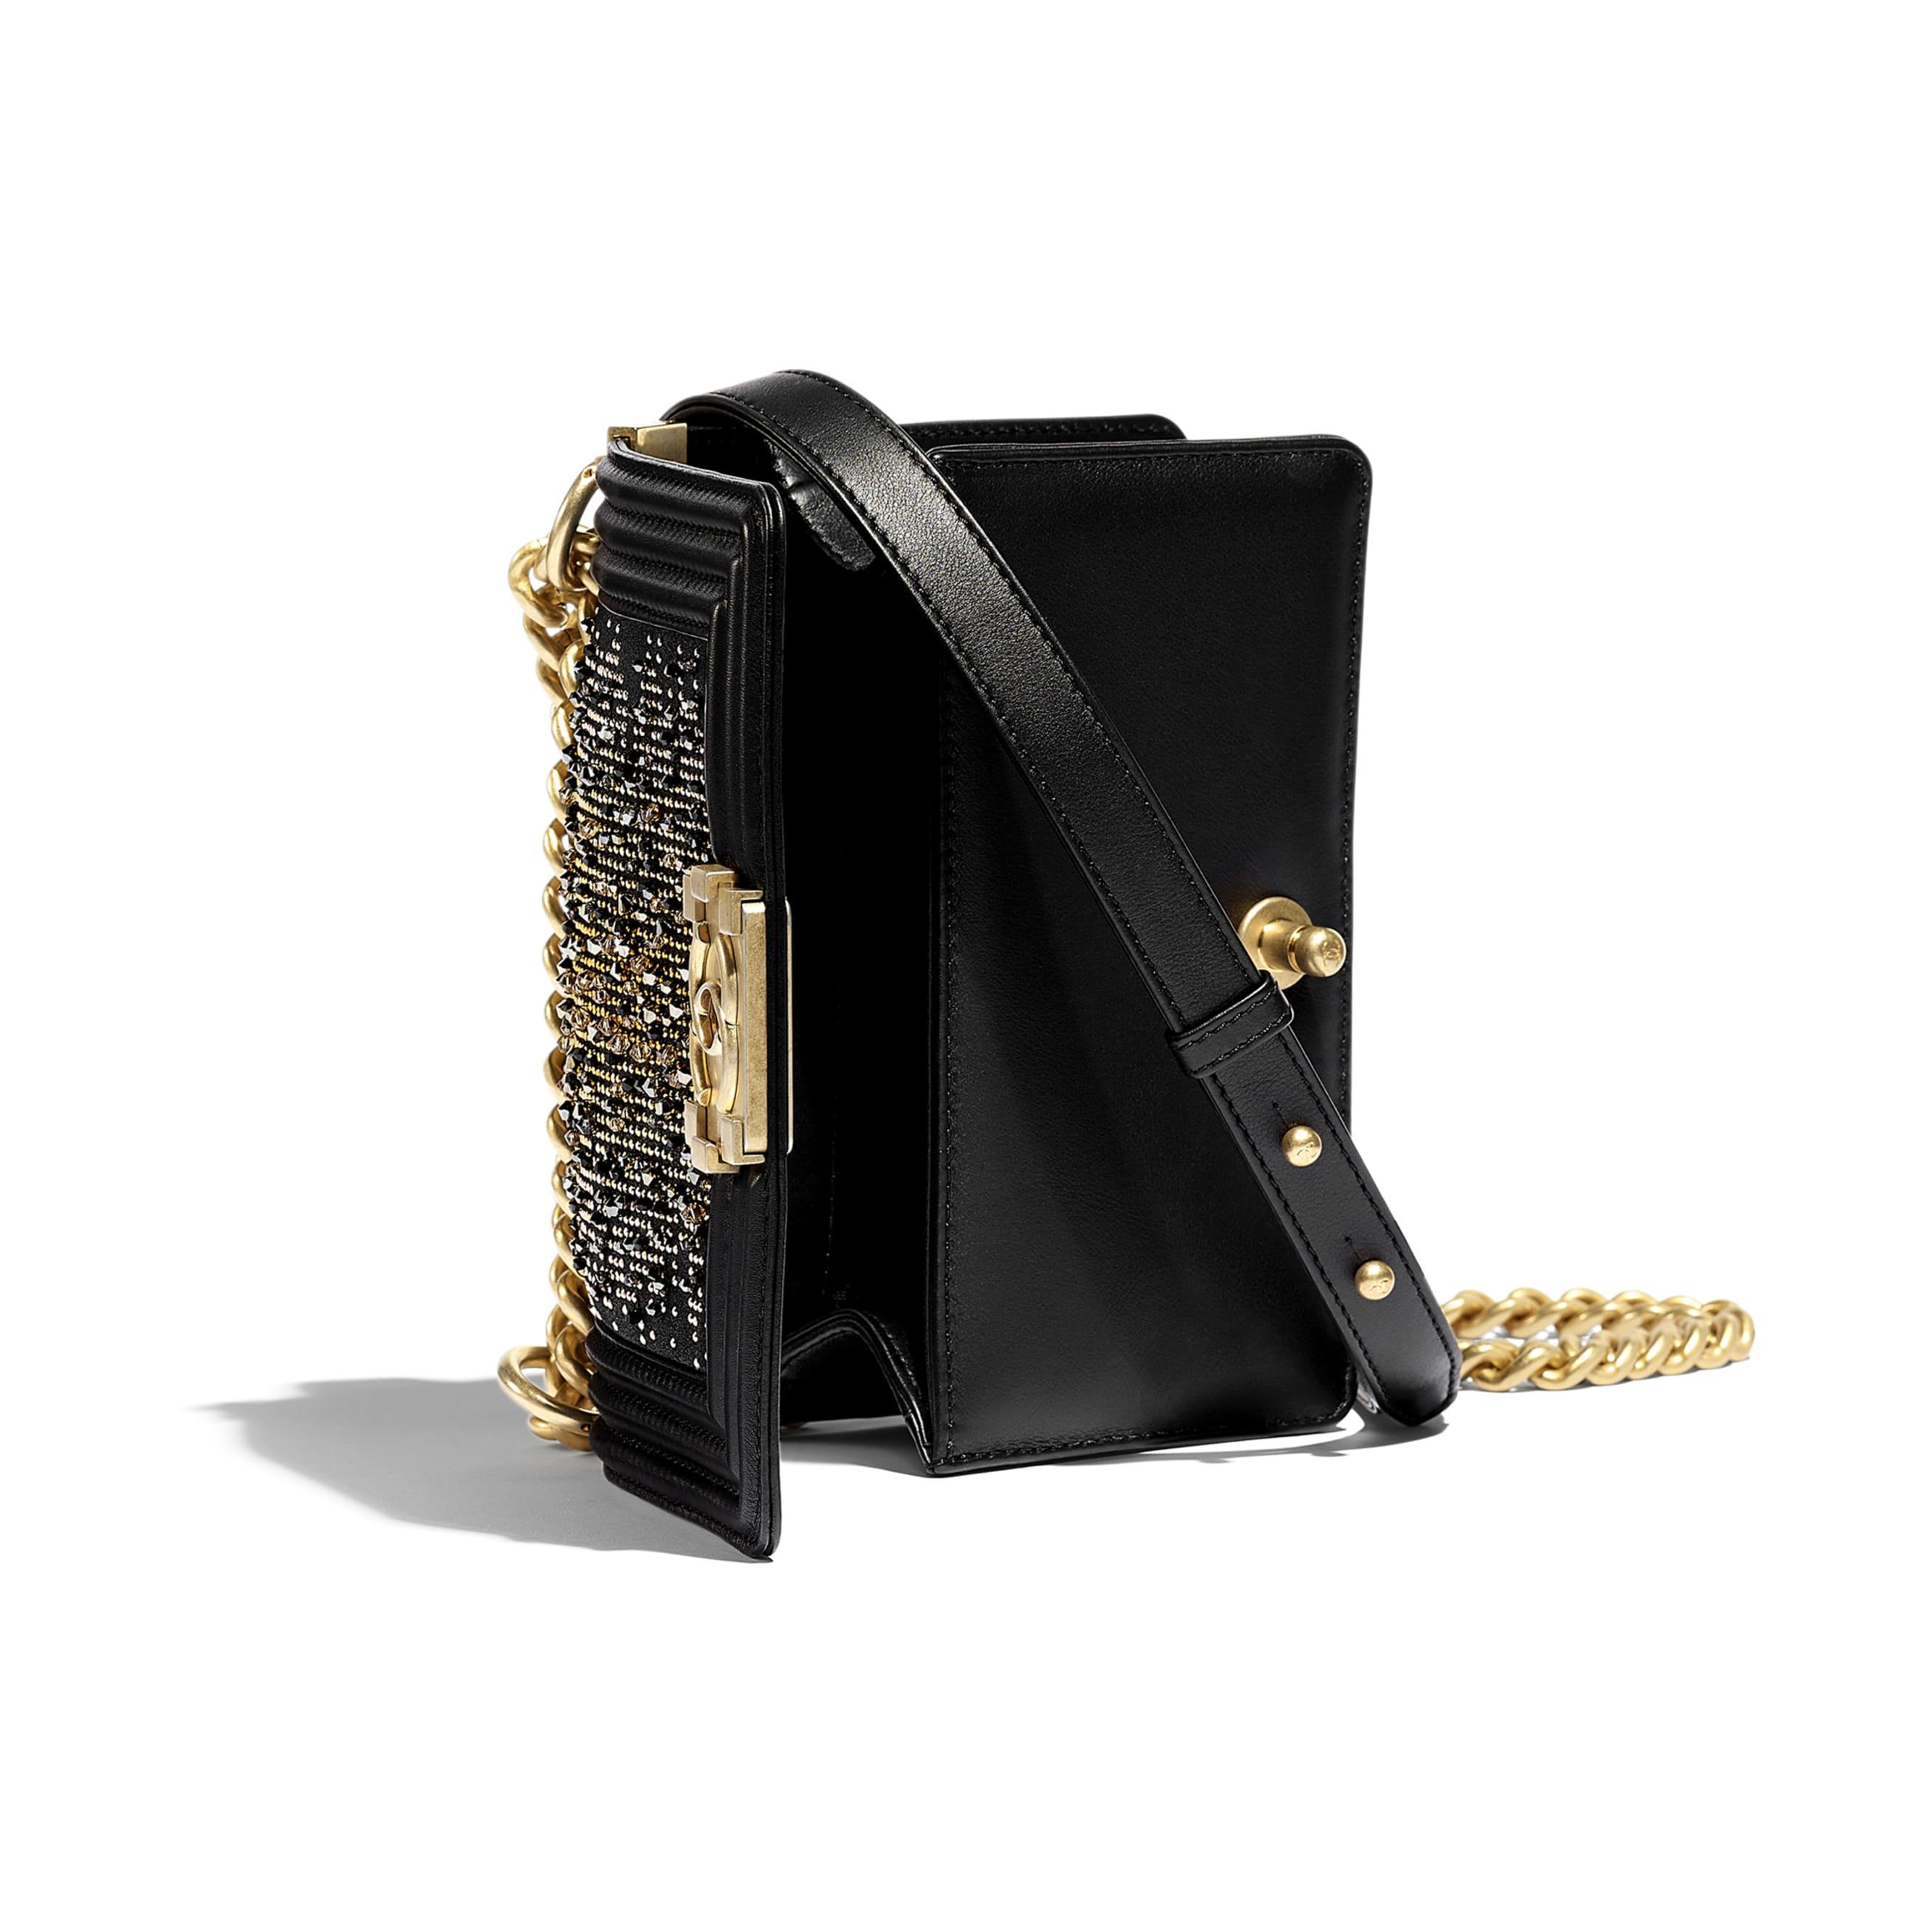 Small BOY CHANEL Handbag - Black - Calfskin, Strass & Gold-Tone Metal - Other view - see standard sized version